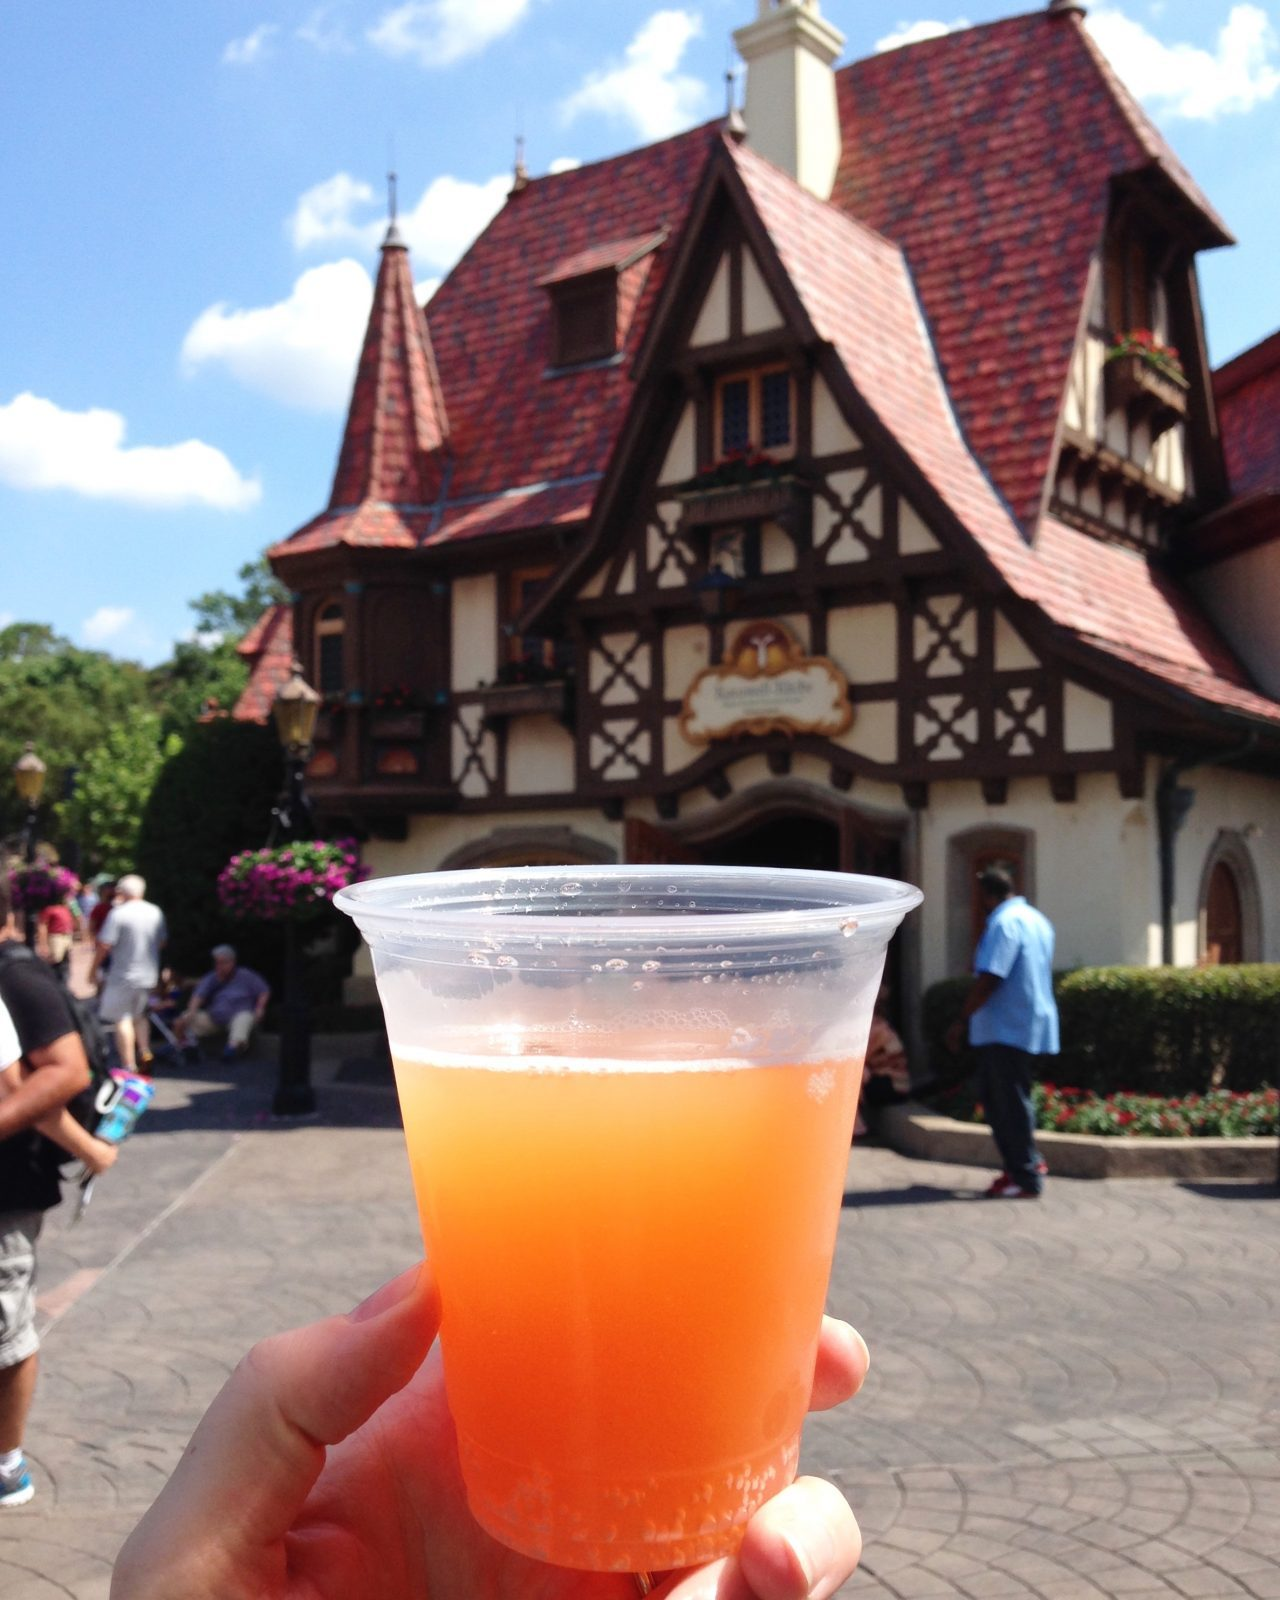 adult beverage at disney